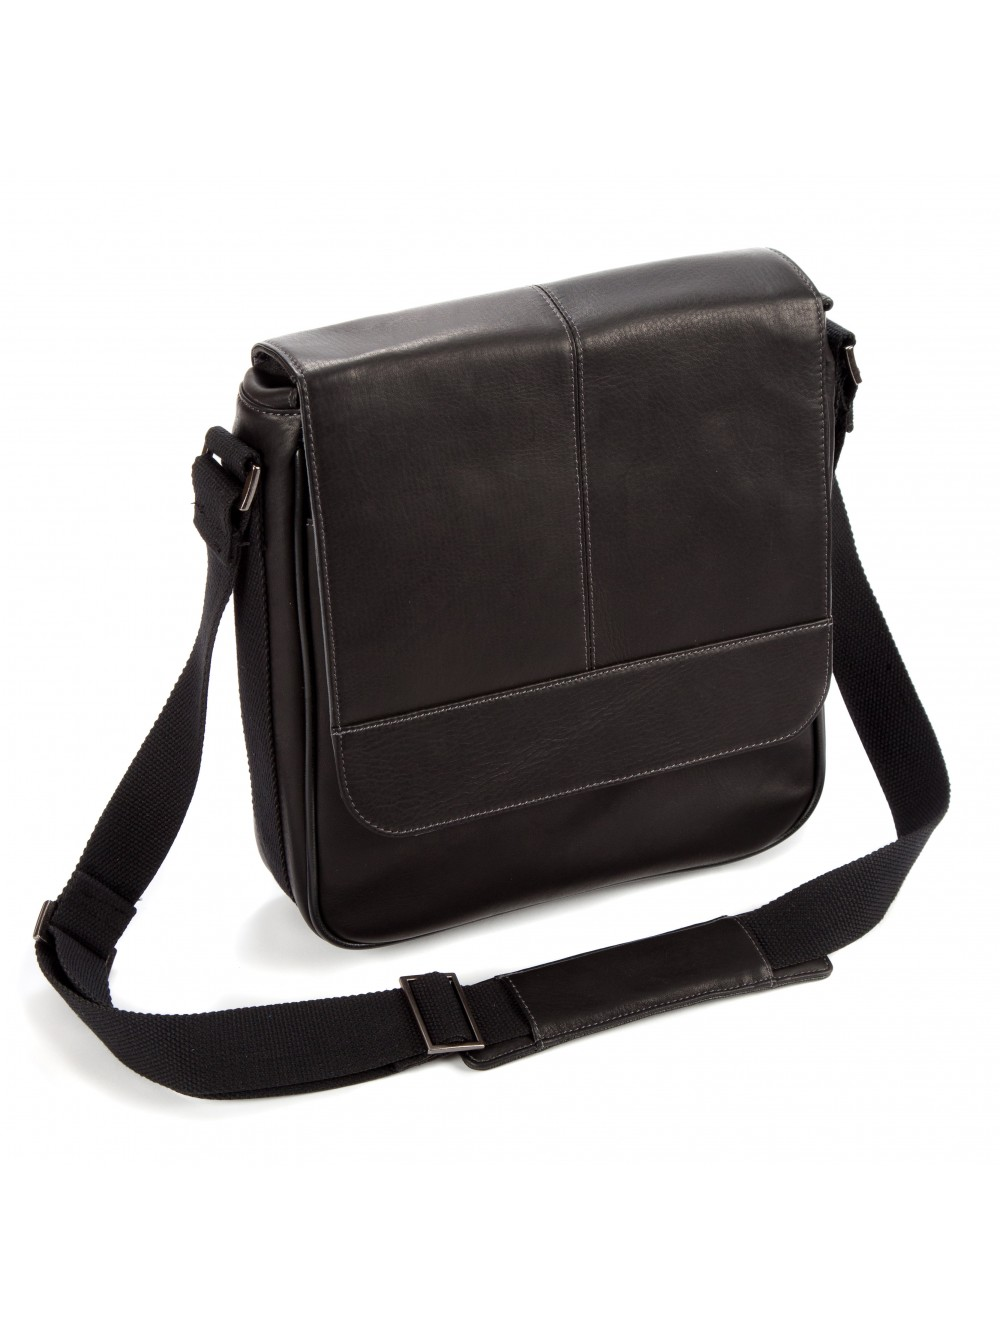 "Falcon Colombian Leather 10.1"" iPad/Tablet Bag - FI6701 Black"